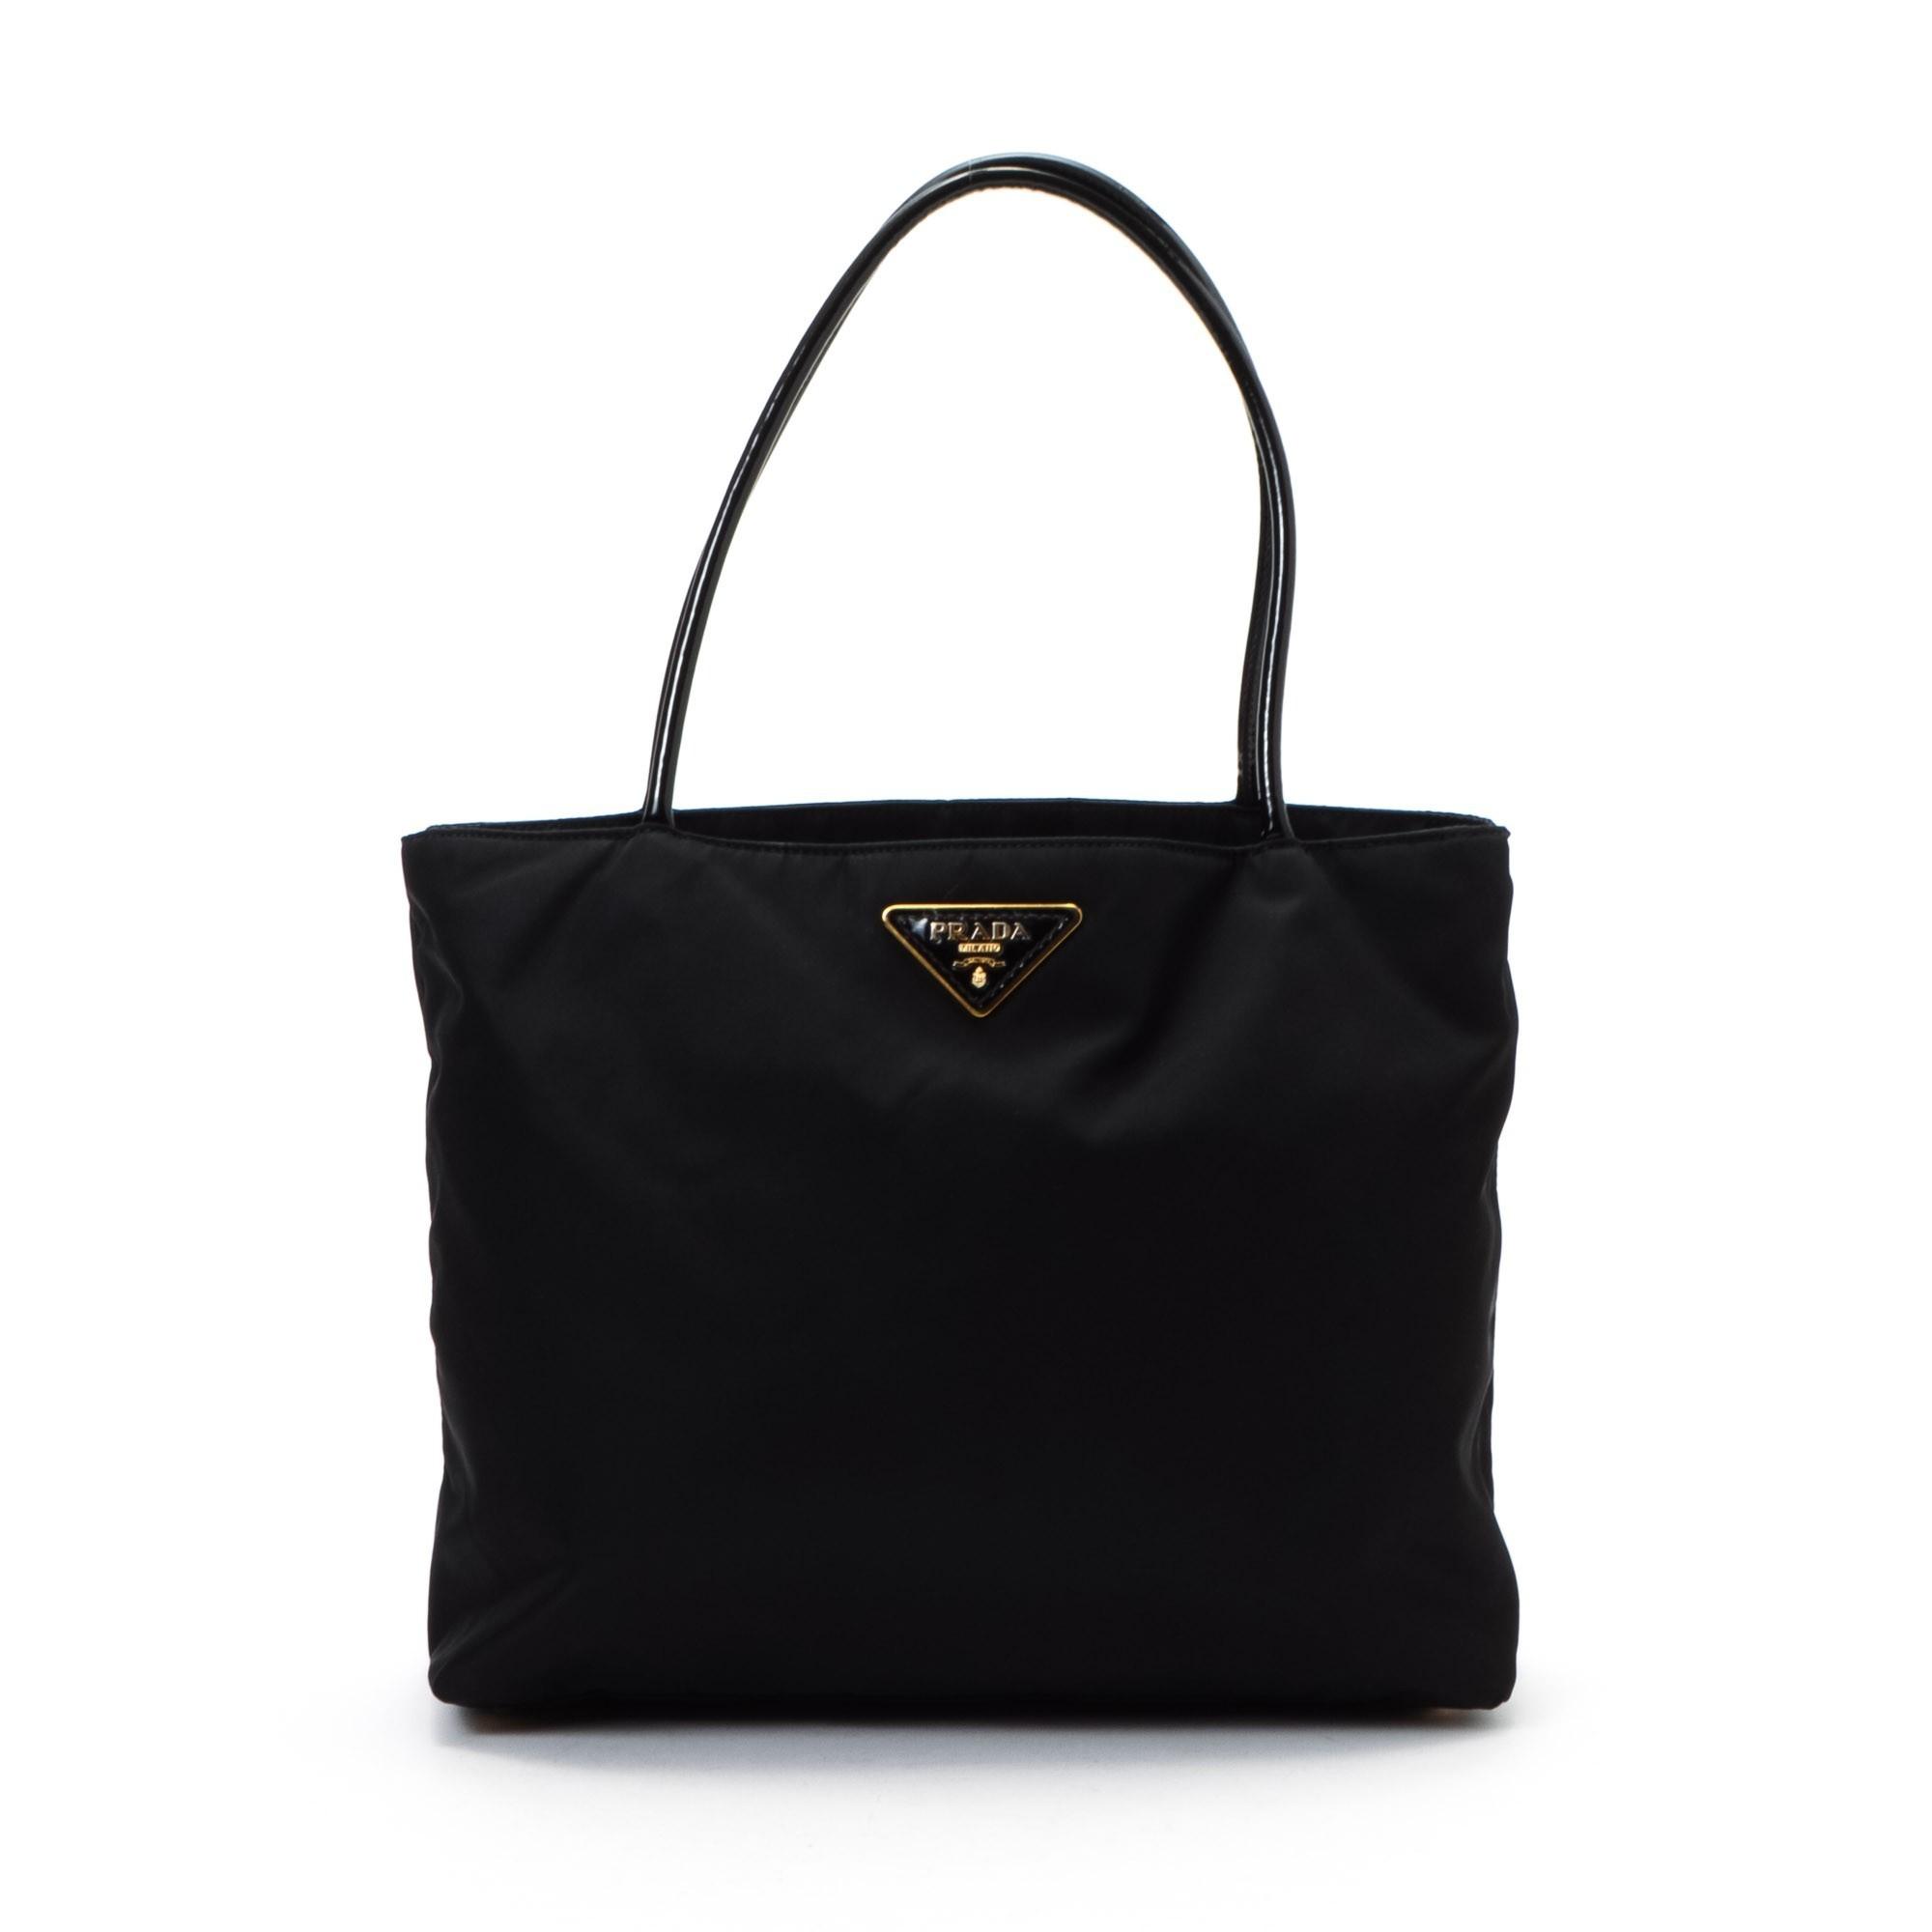 prada saffiano wallet white - Prada Tessuto Tote Black Nylon Tote - LXR\u0026amp;CO Vintage Luxury